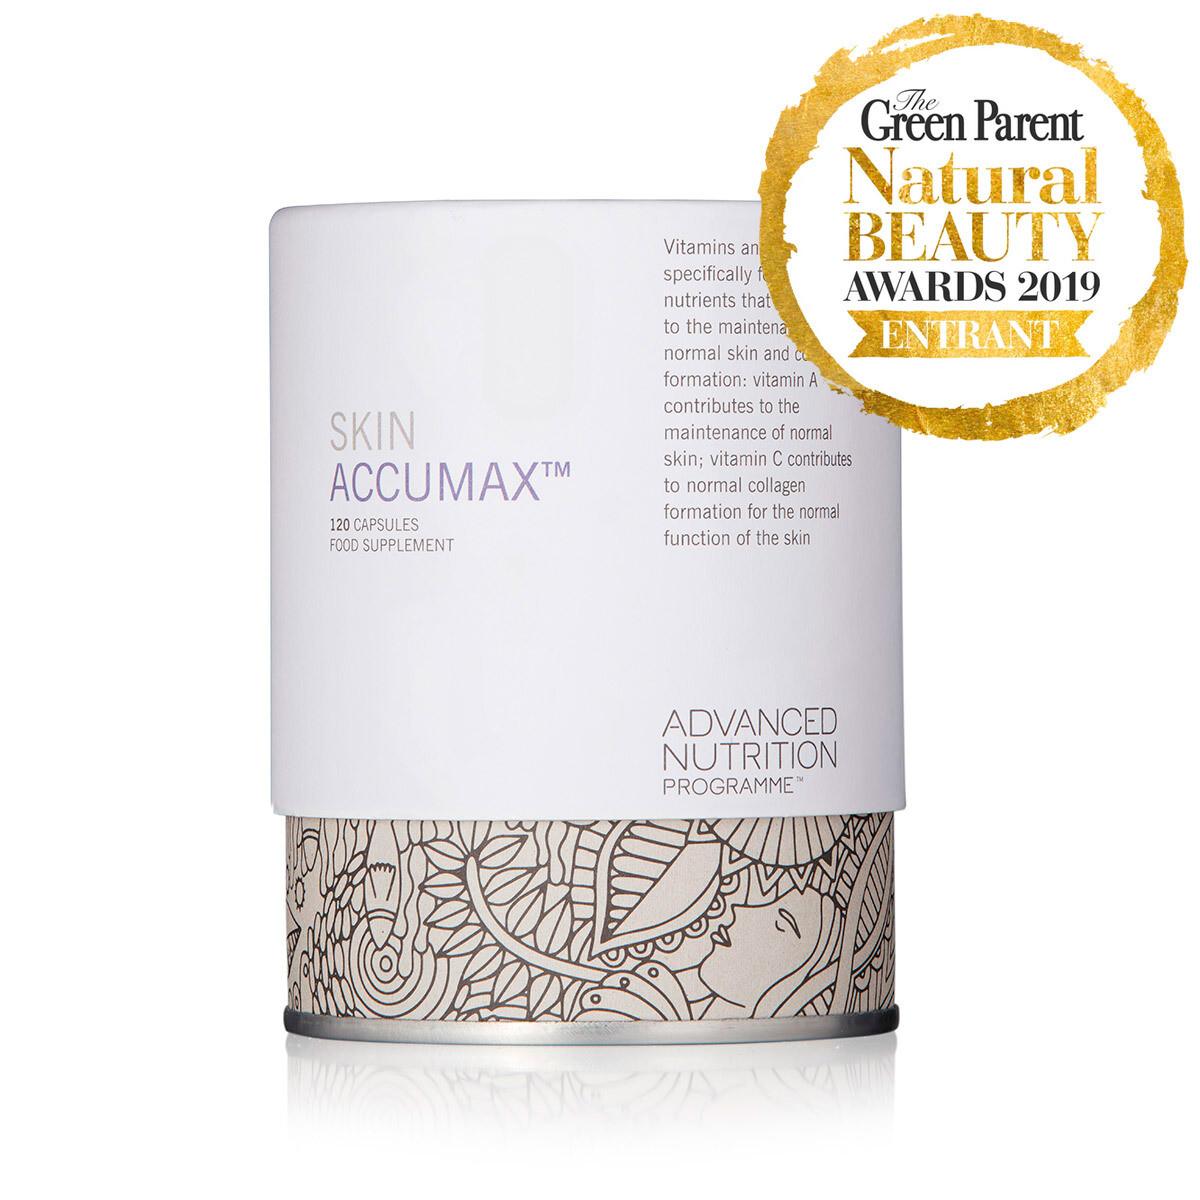 Аккумакс для проблемной кожи (120 капс) | Skin Accumax Advanced Nutrition Programme